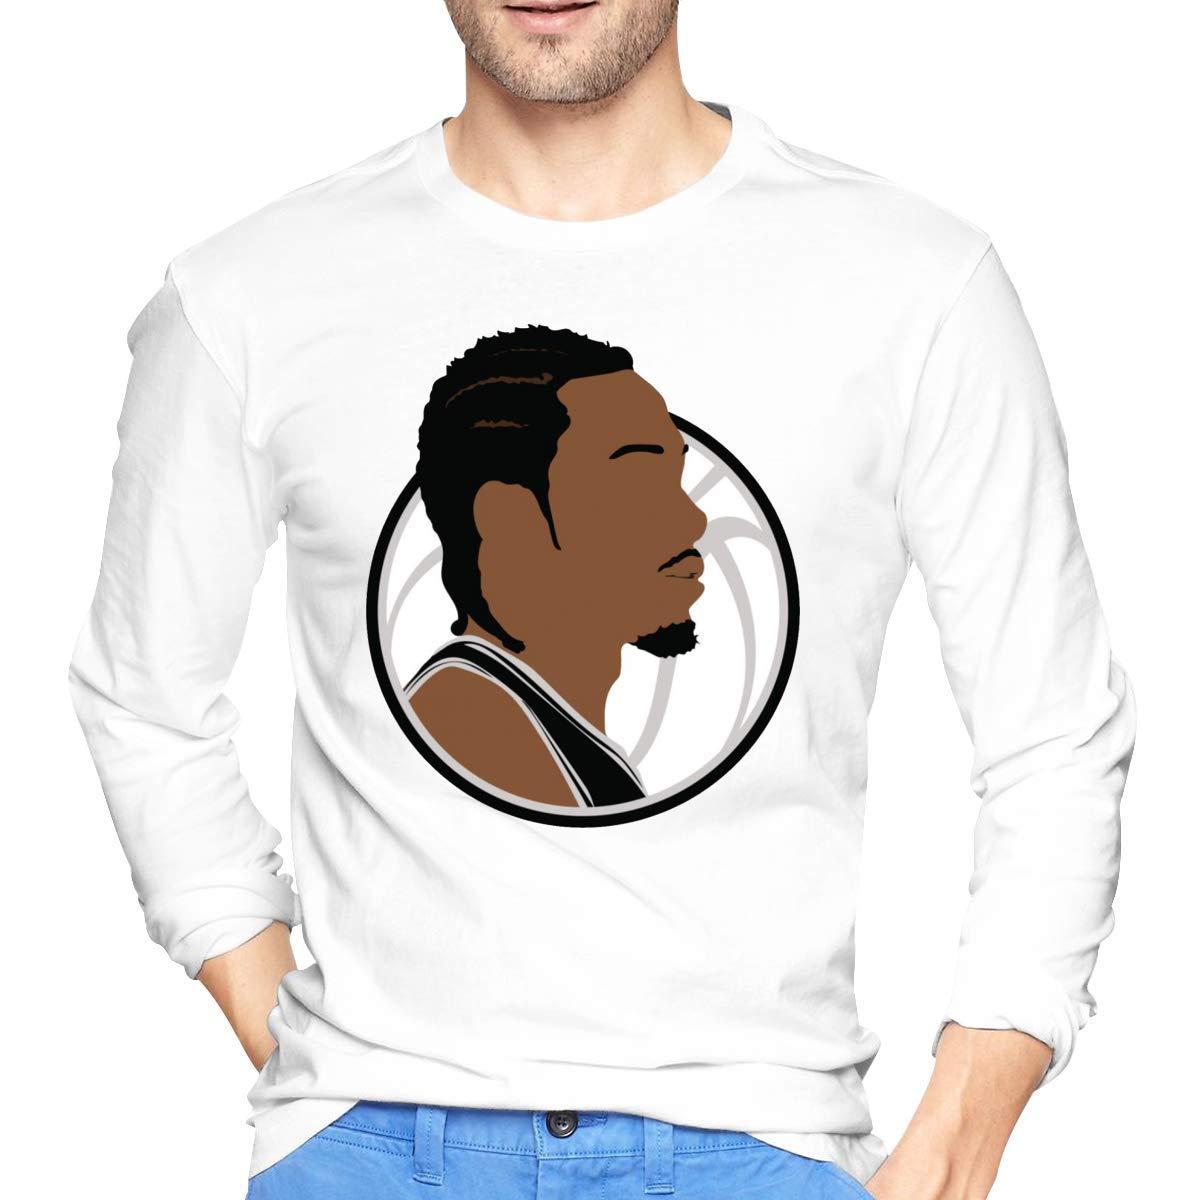 S Basketball Clothing Superior Kawhi Shirt